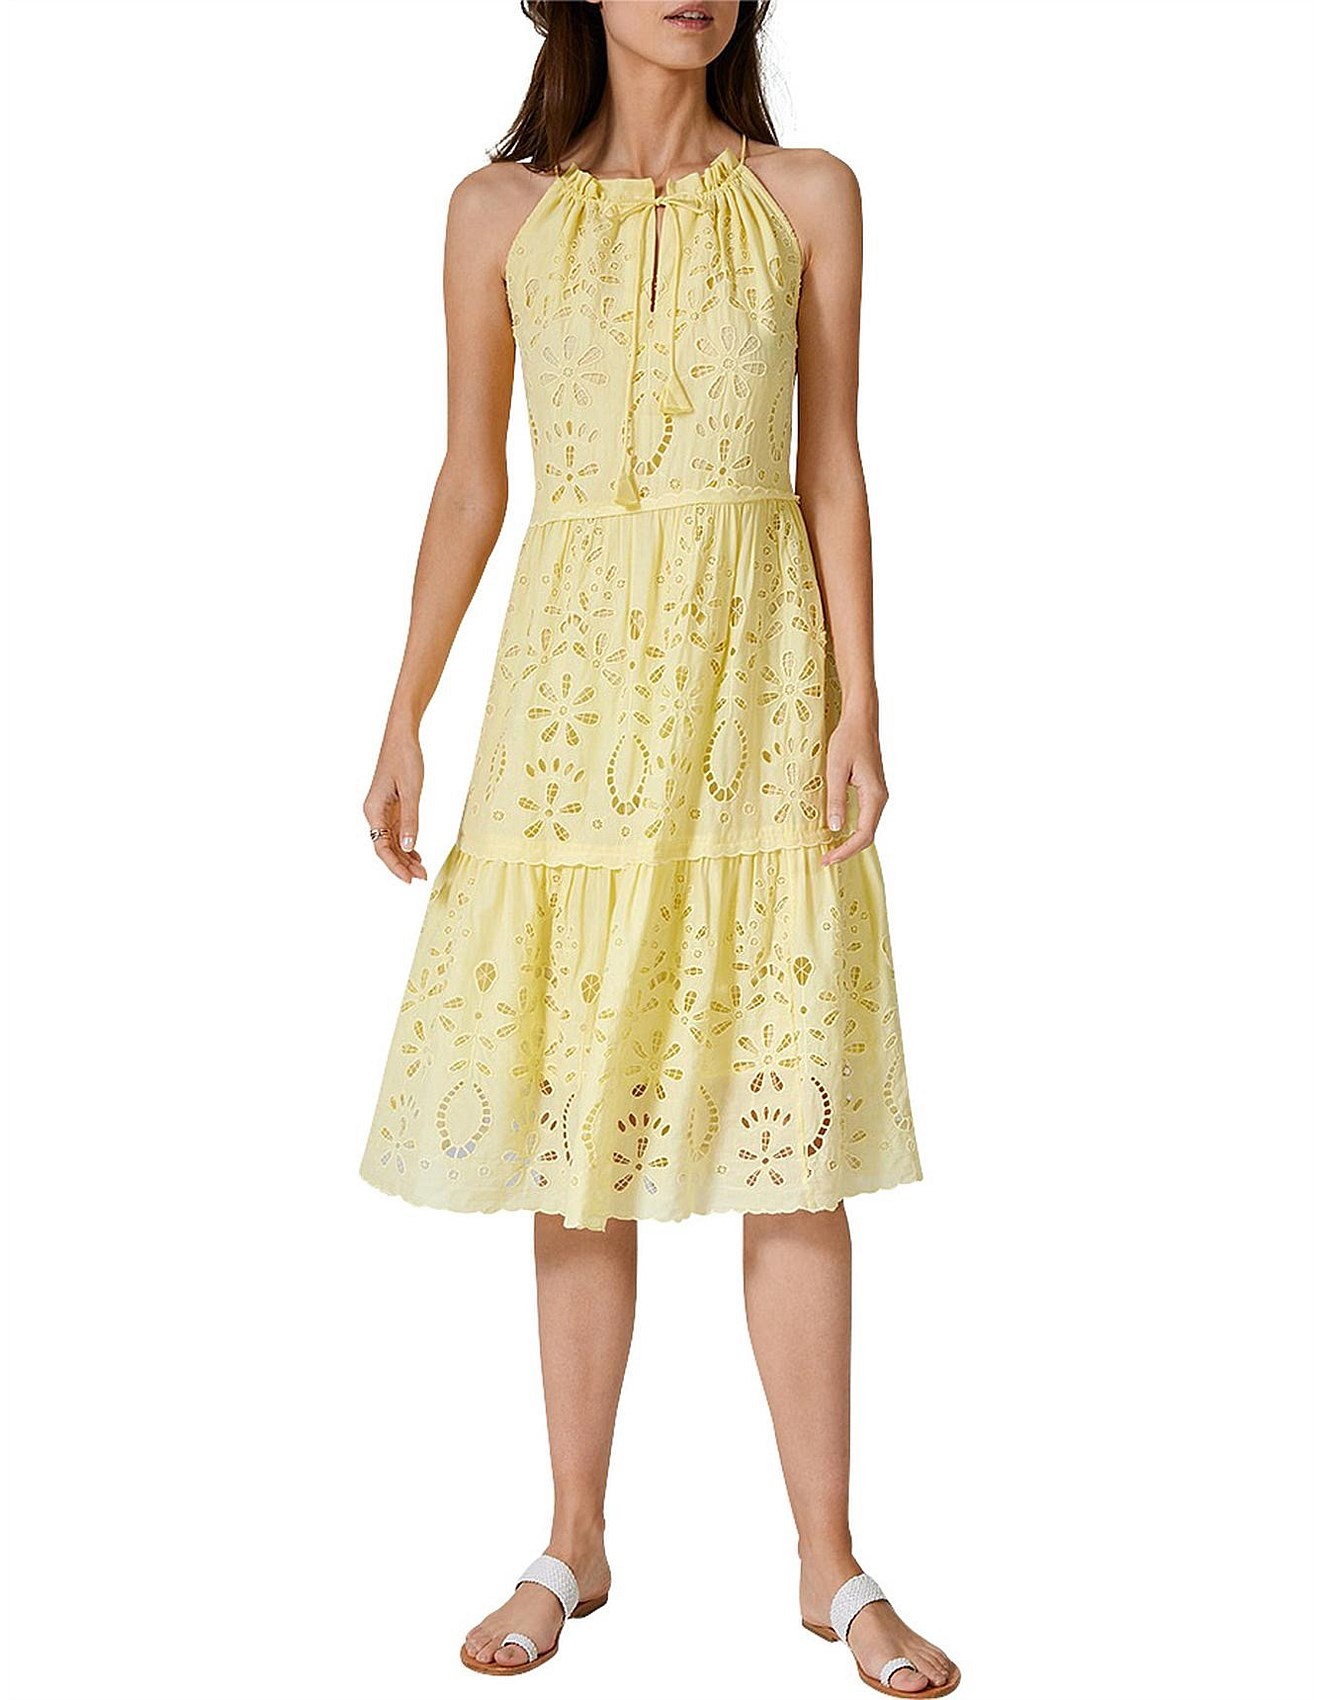 bdf82670ad Day Dresses | Buy Casual Summer Dresses Online | David Jones - Tiered  Broderie Dress